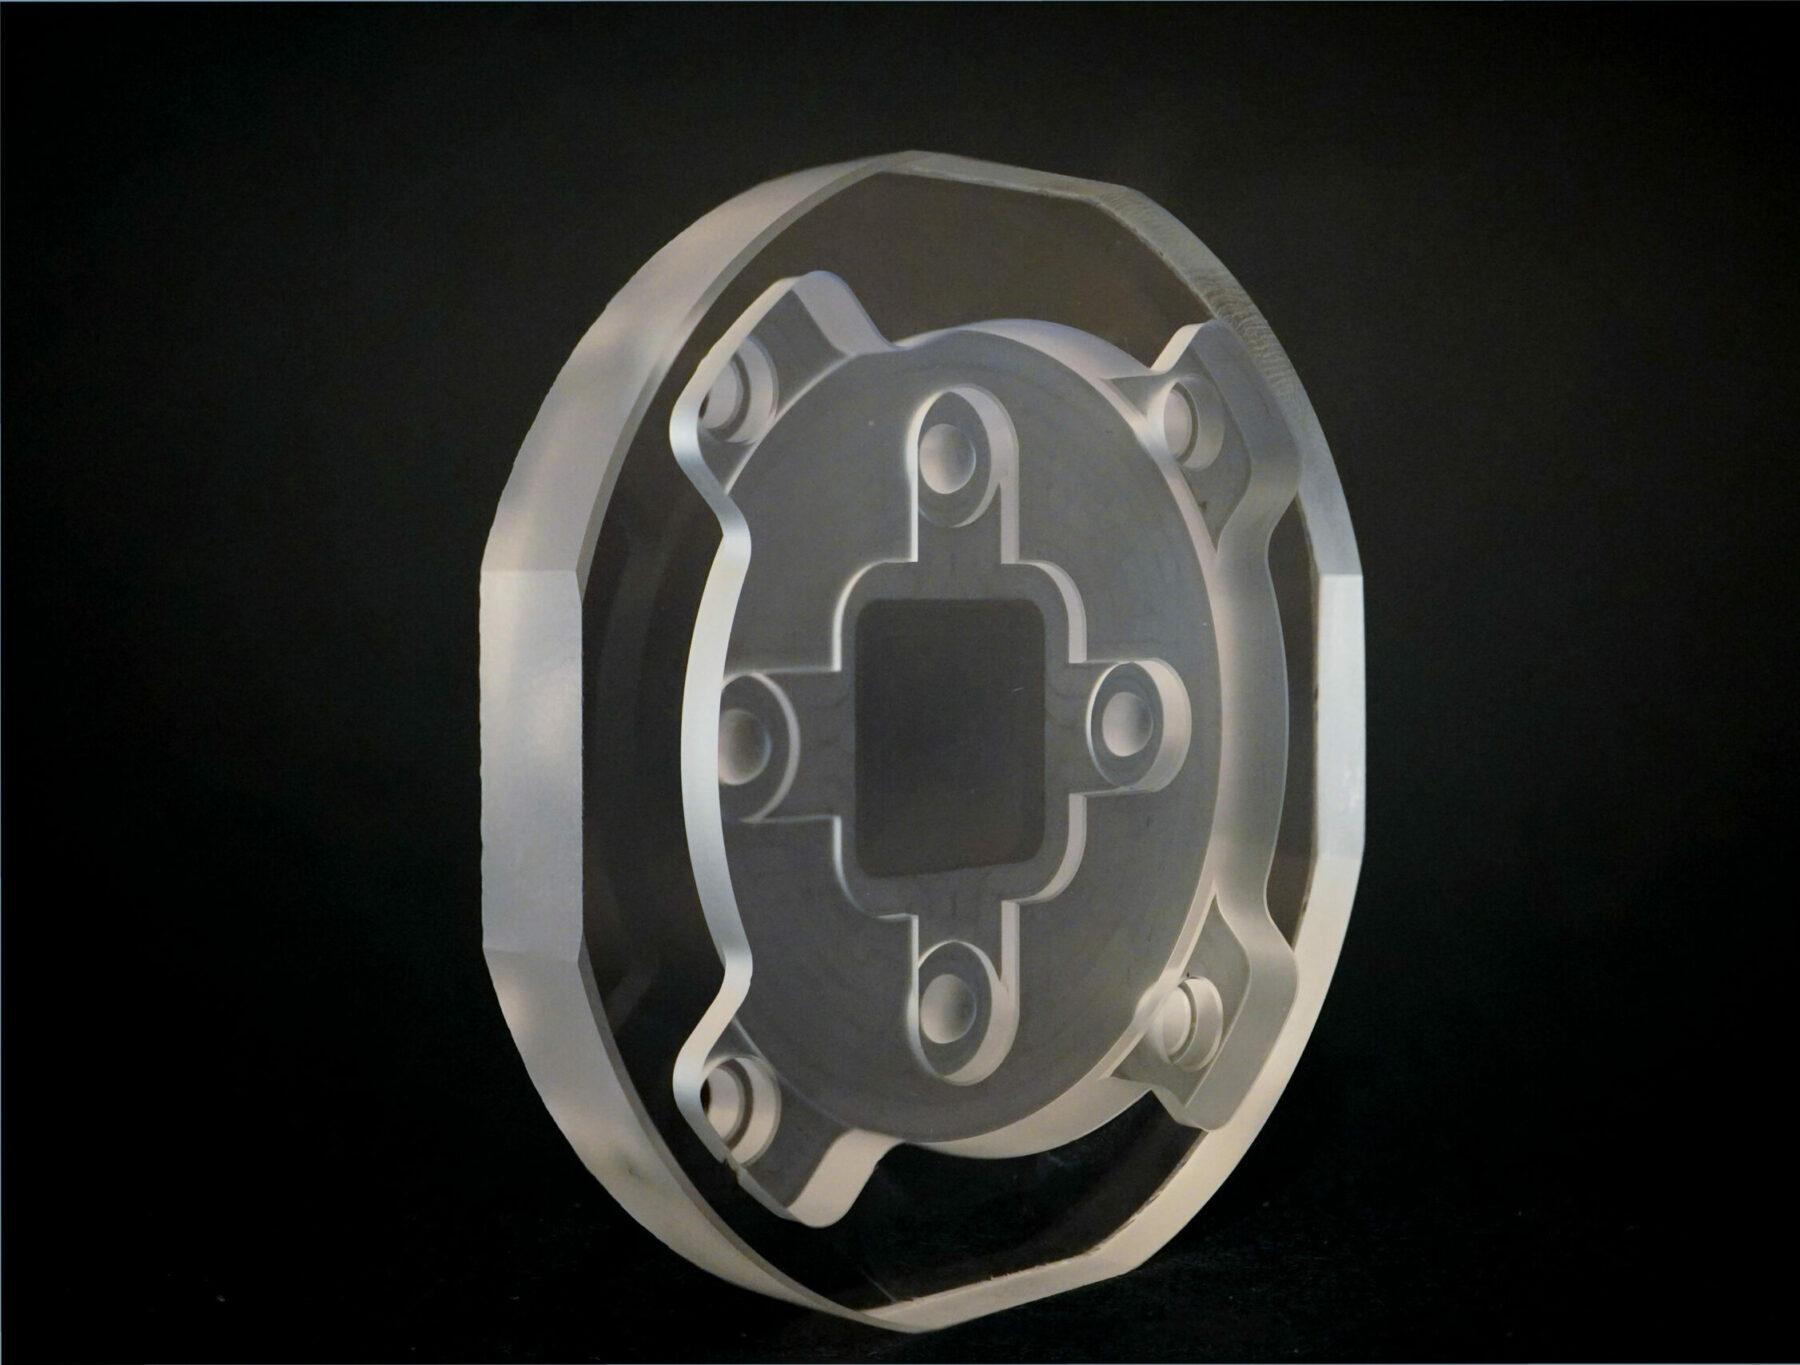 Sensoroptik aus Glas mit integrierten Befestigungsgeometrien